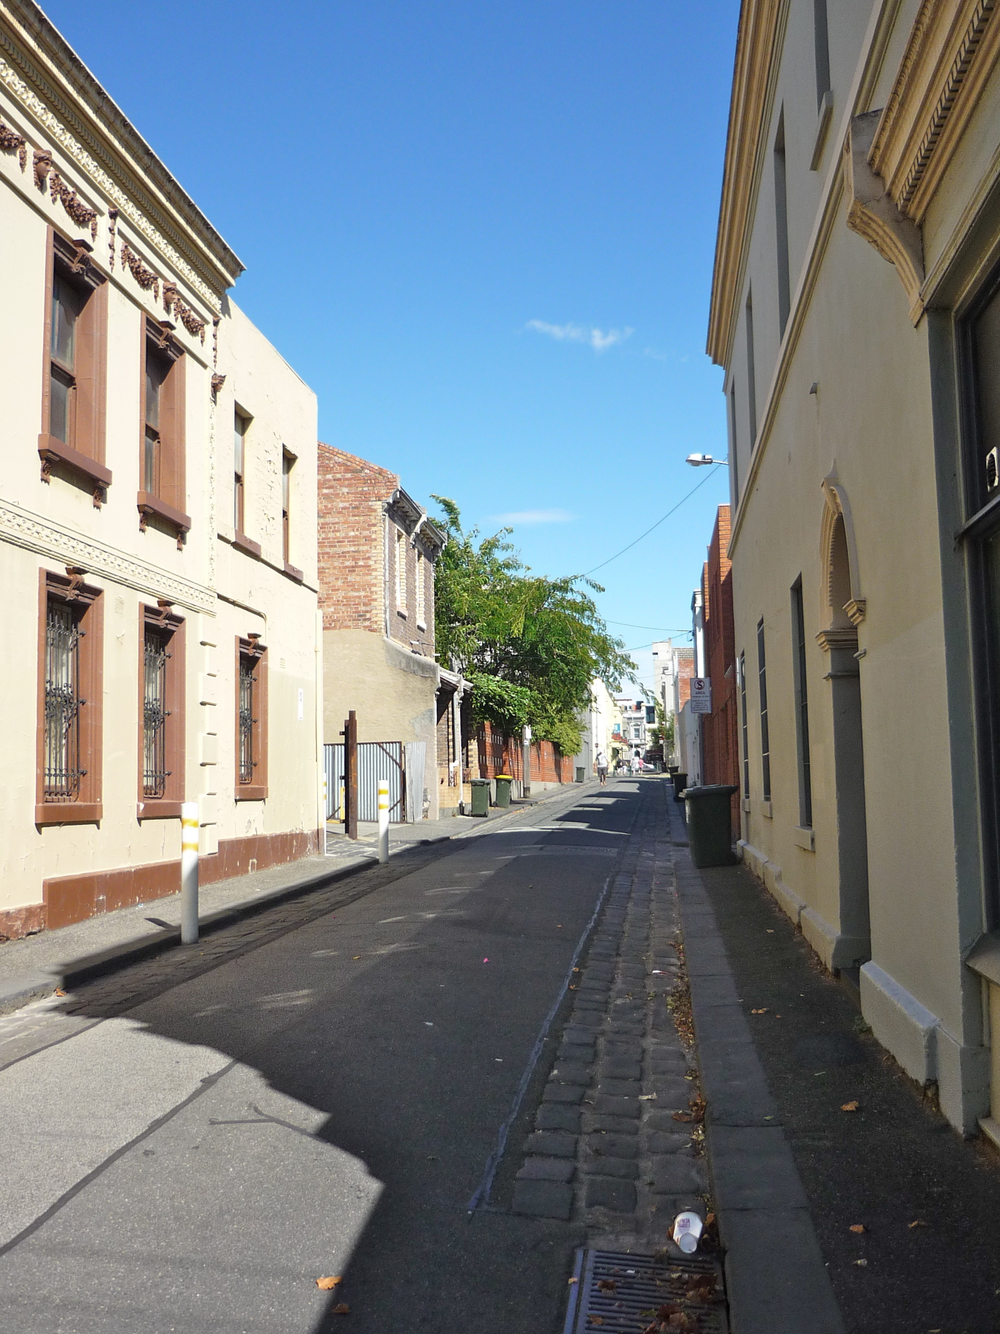 University St. Melbourne